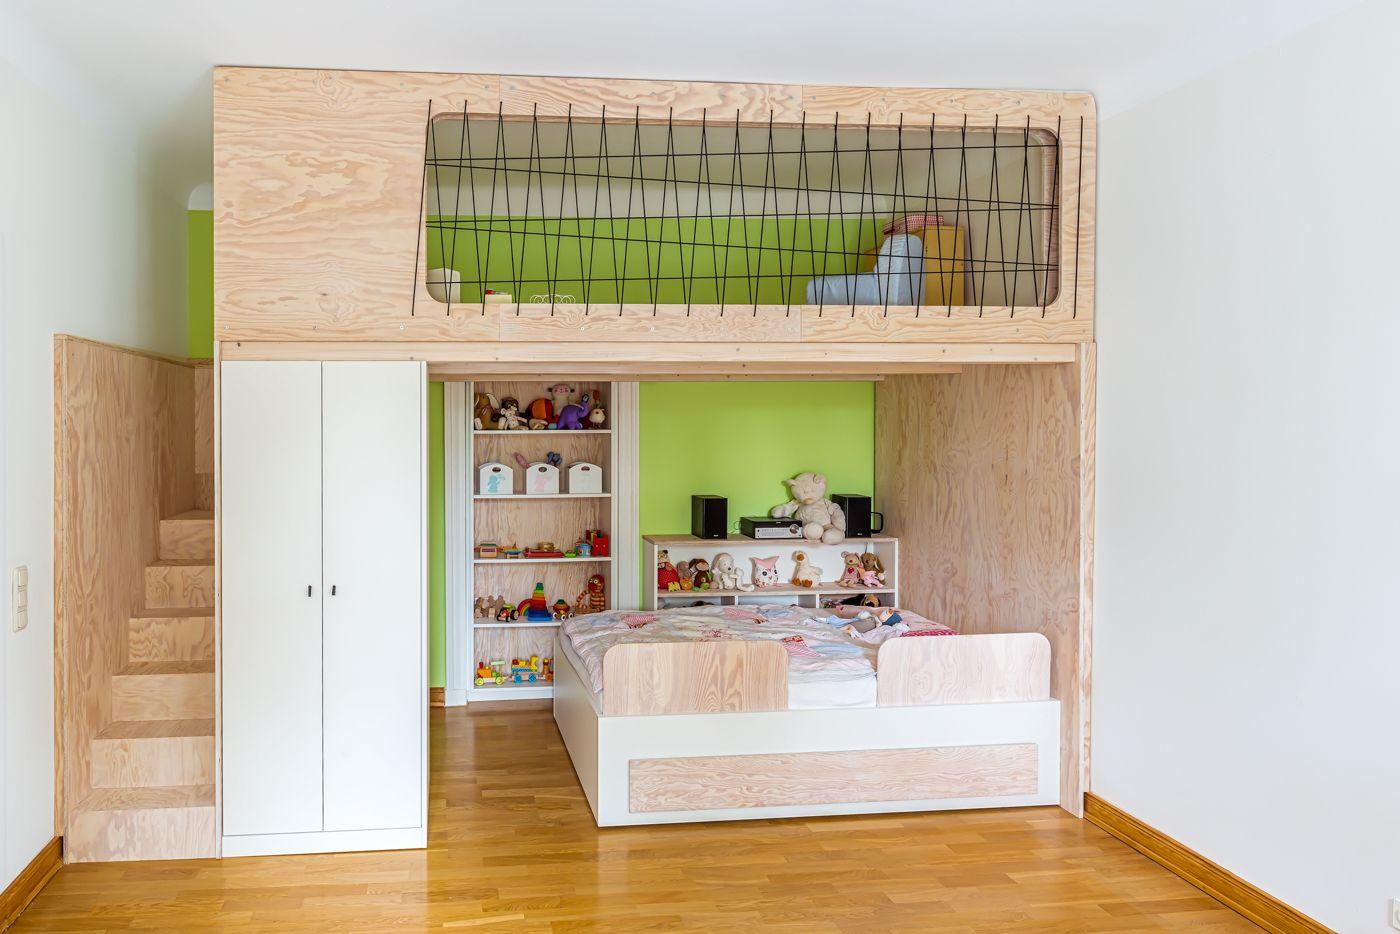 Full Size of Hochetage Kinderzimmer Regal Regale Sofa Weiß Kinderzimmer Hochbetten Kinderzimmer